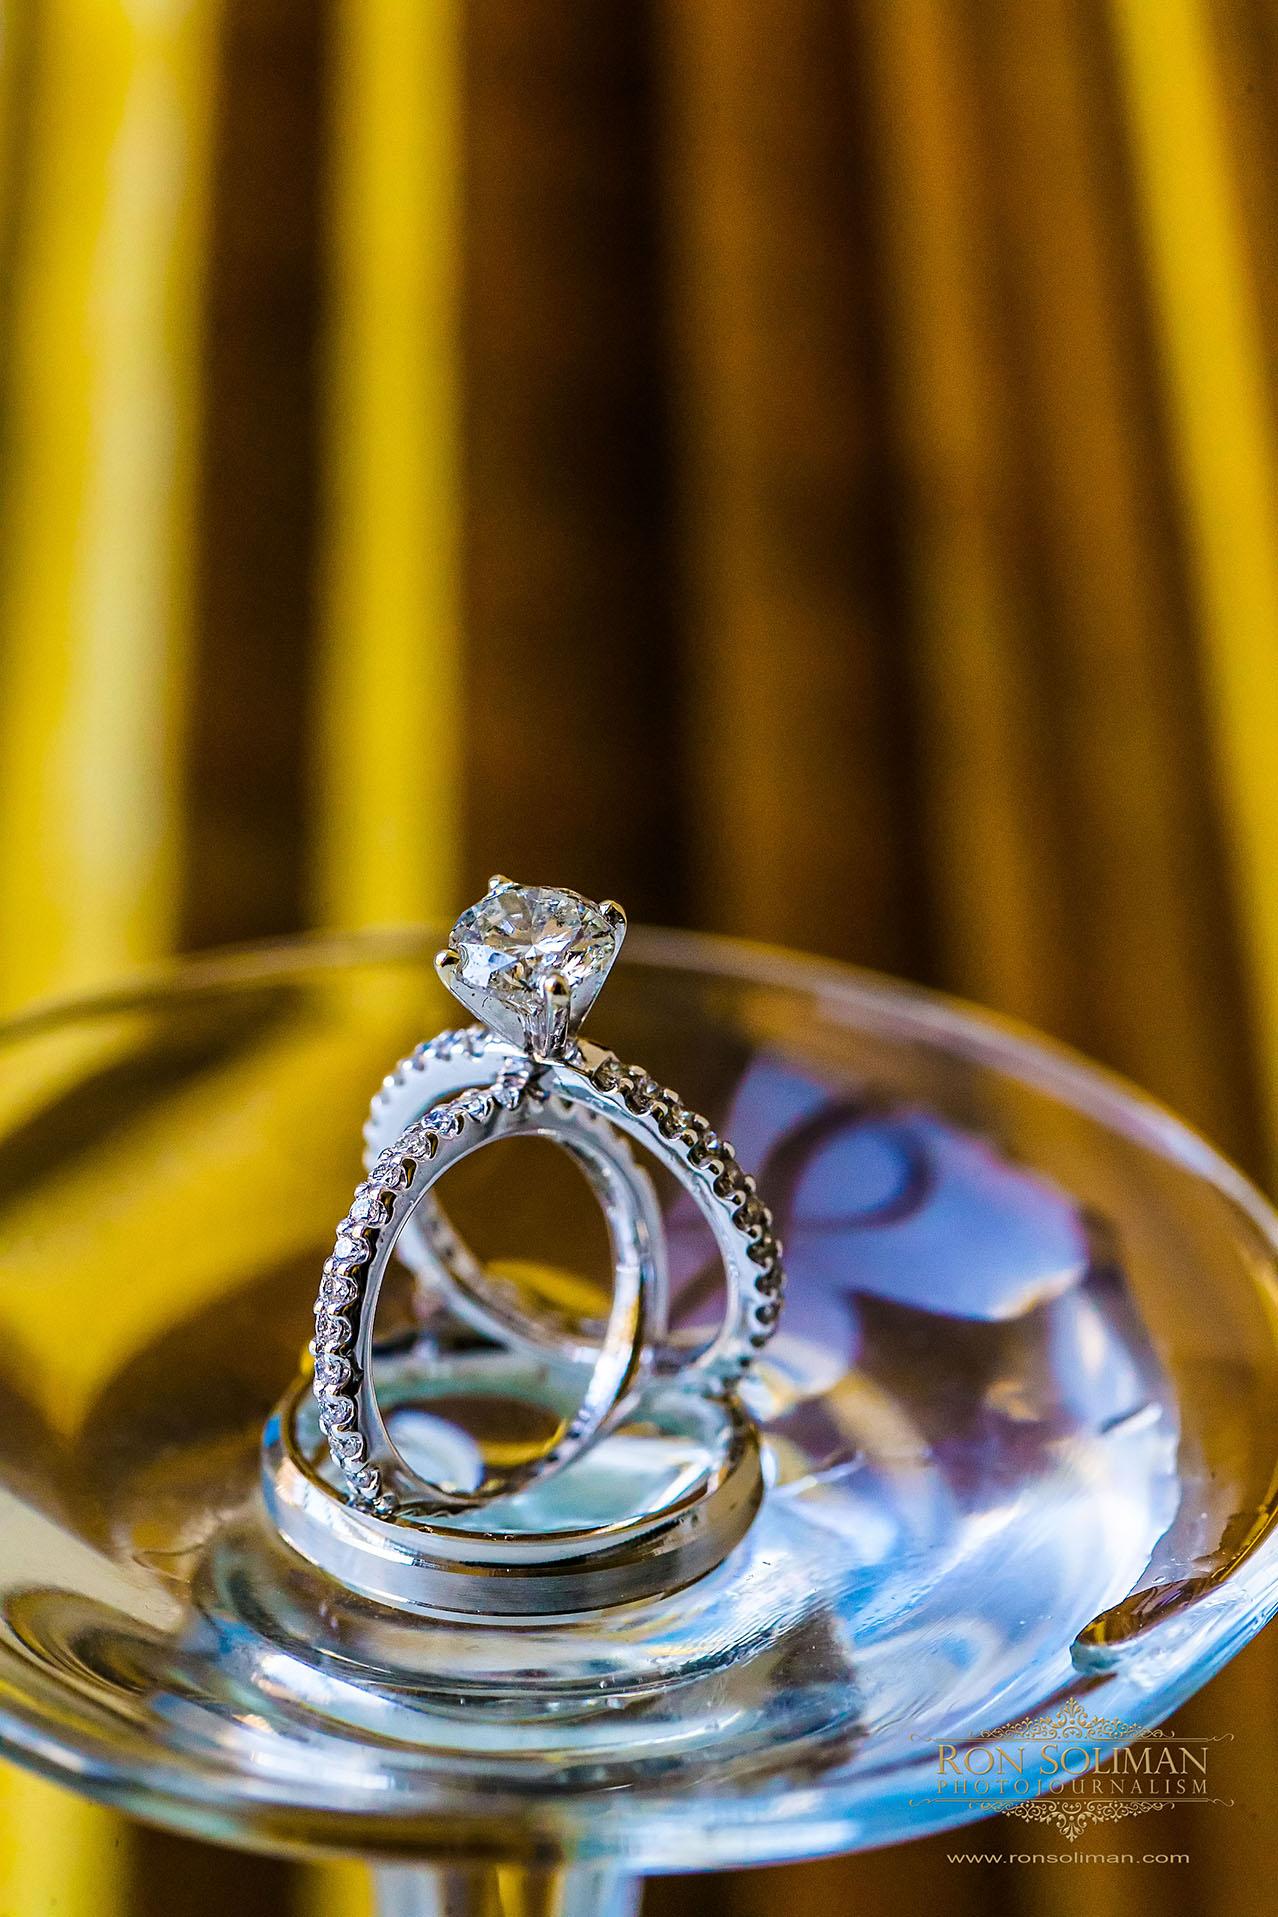 Best wedding ring photos